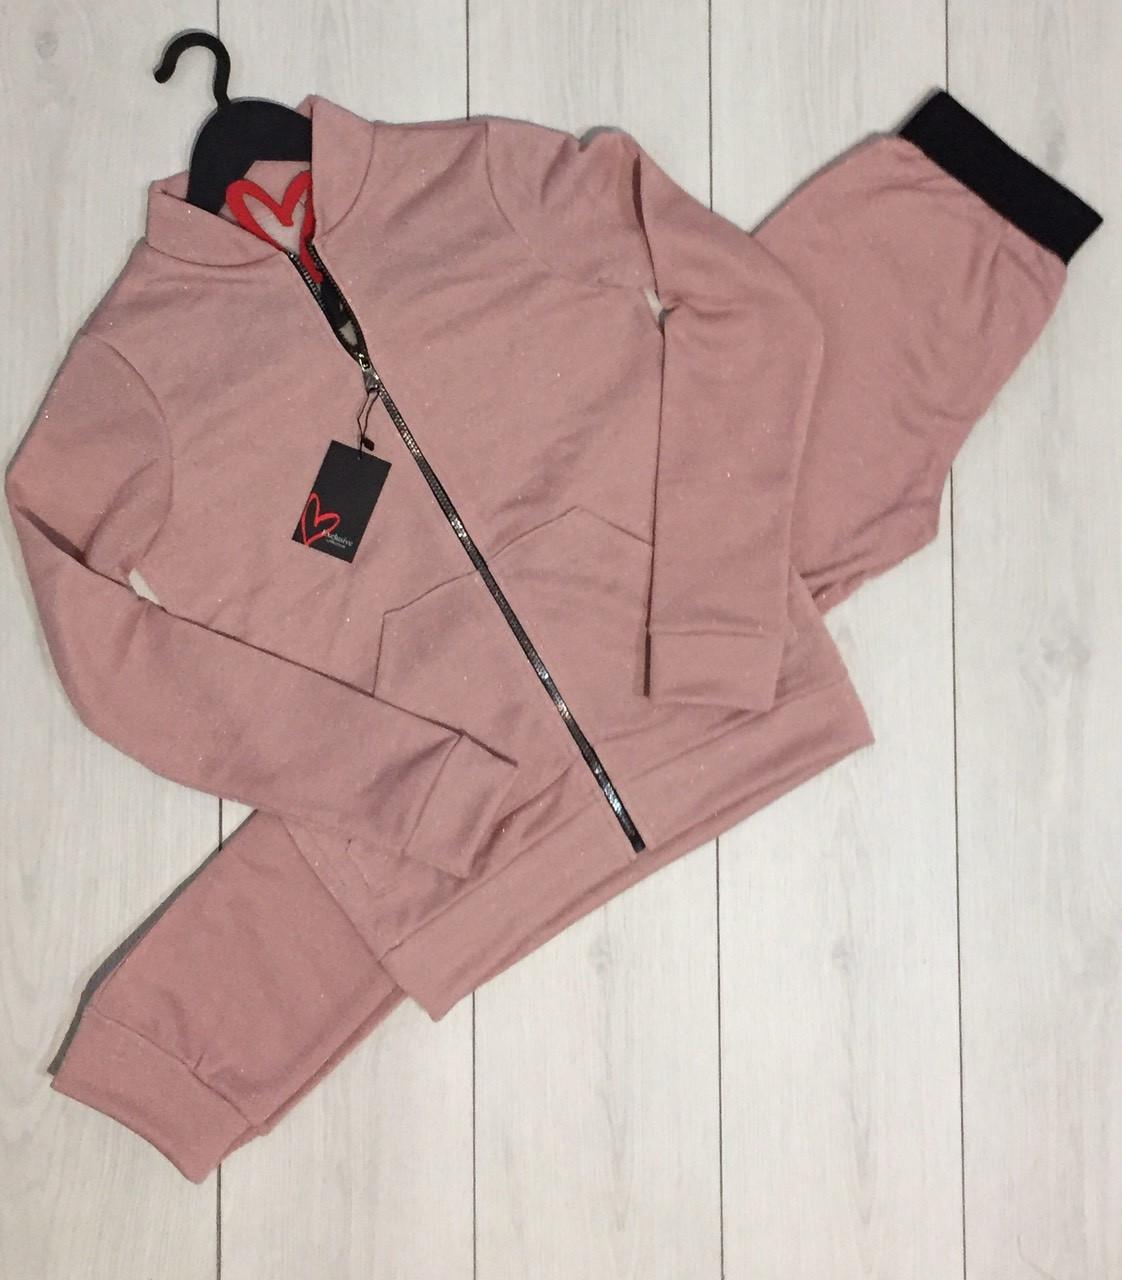 Теплый брючный костюм ТМExclusive: мастерка и штаны на манжетах